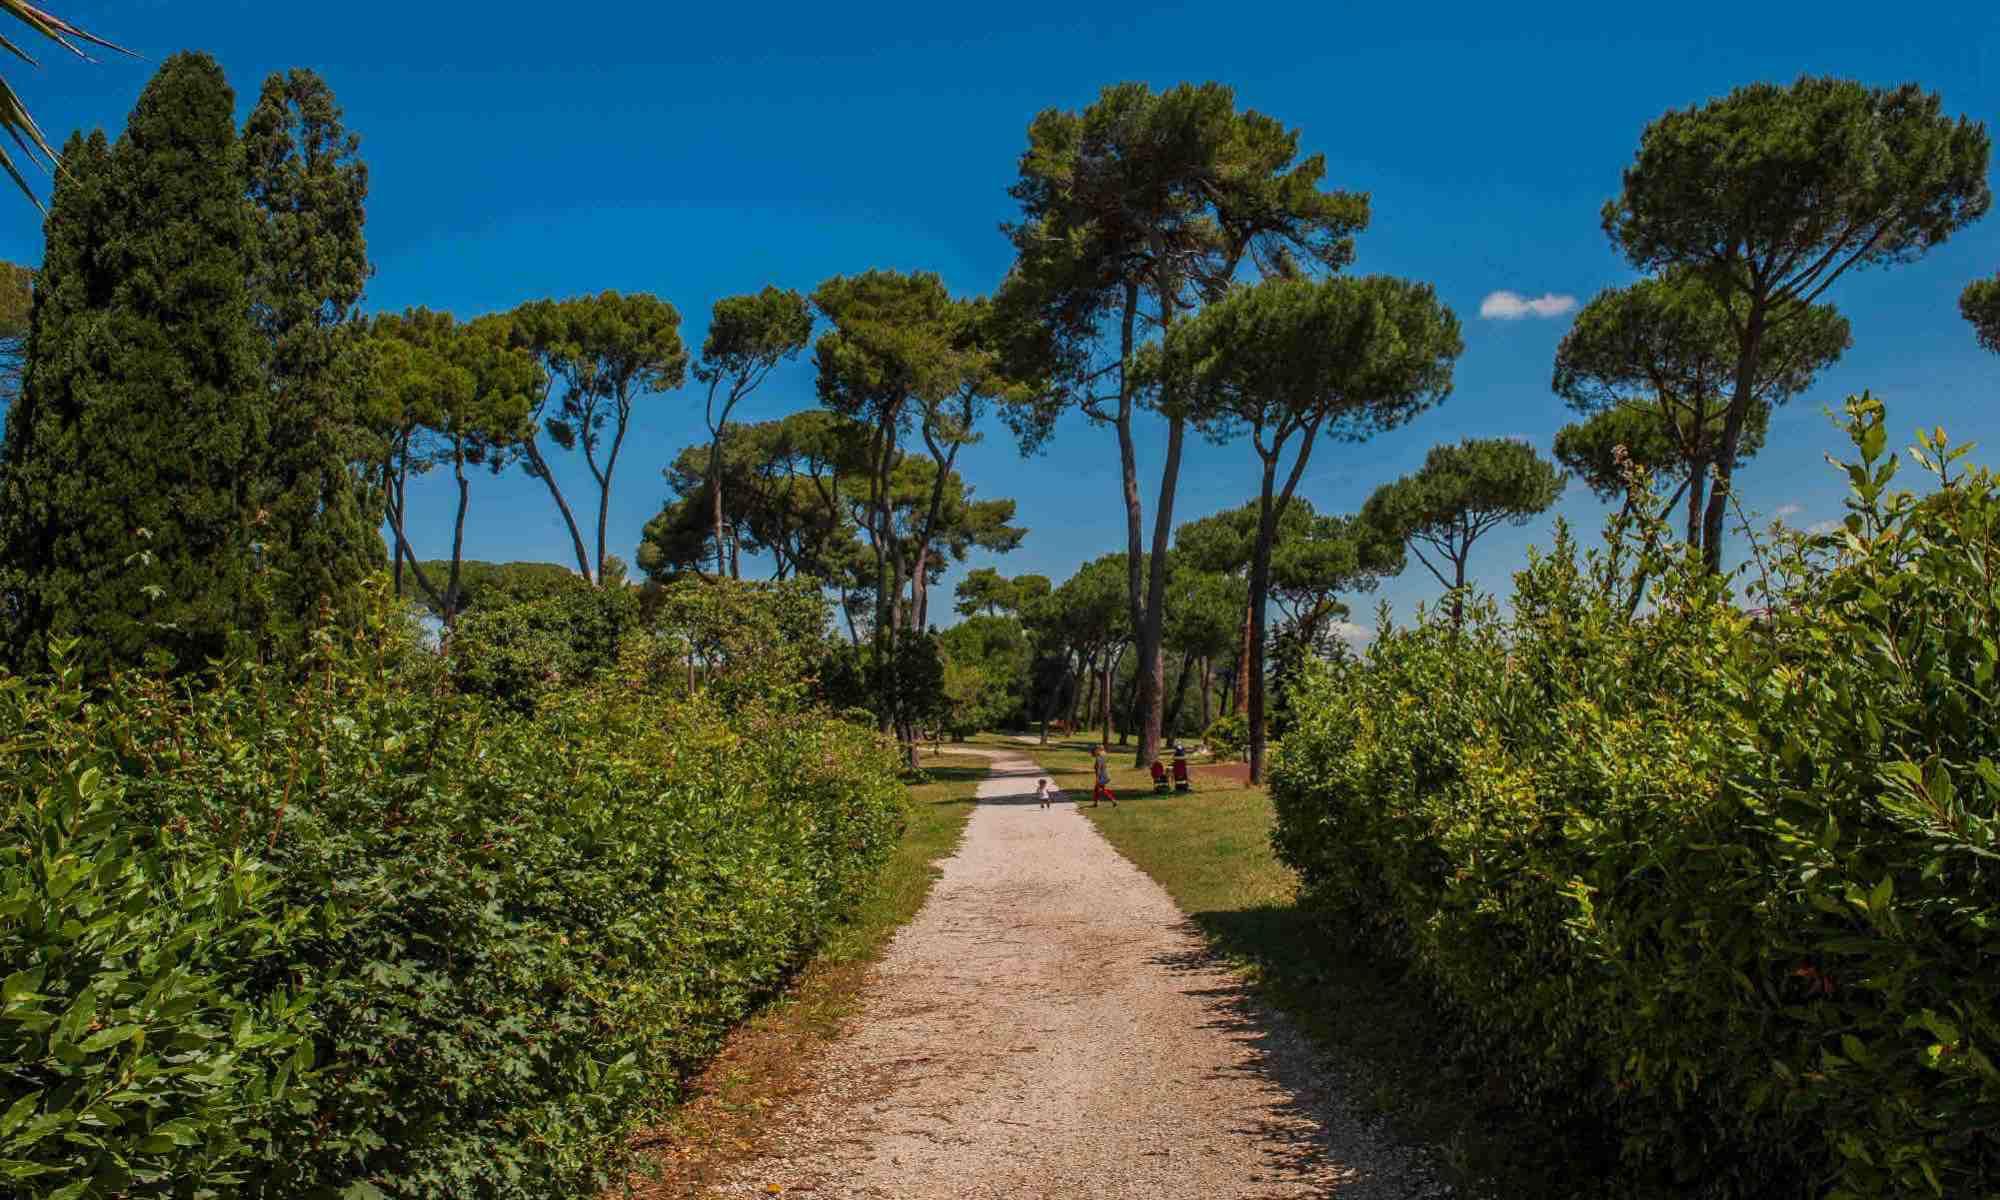 verde-alberi-viale-cespugli-cielo